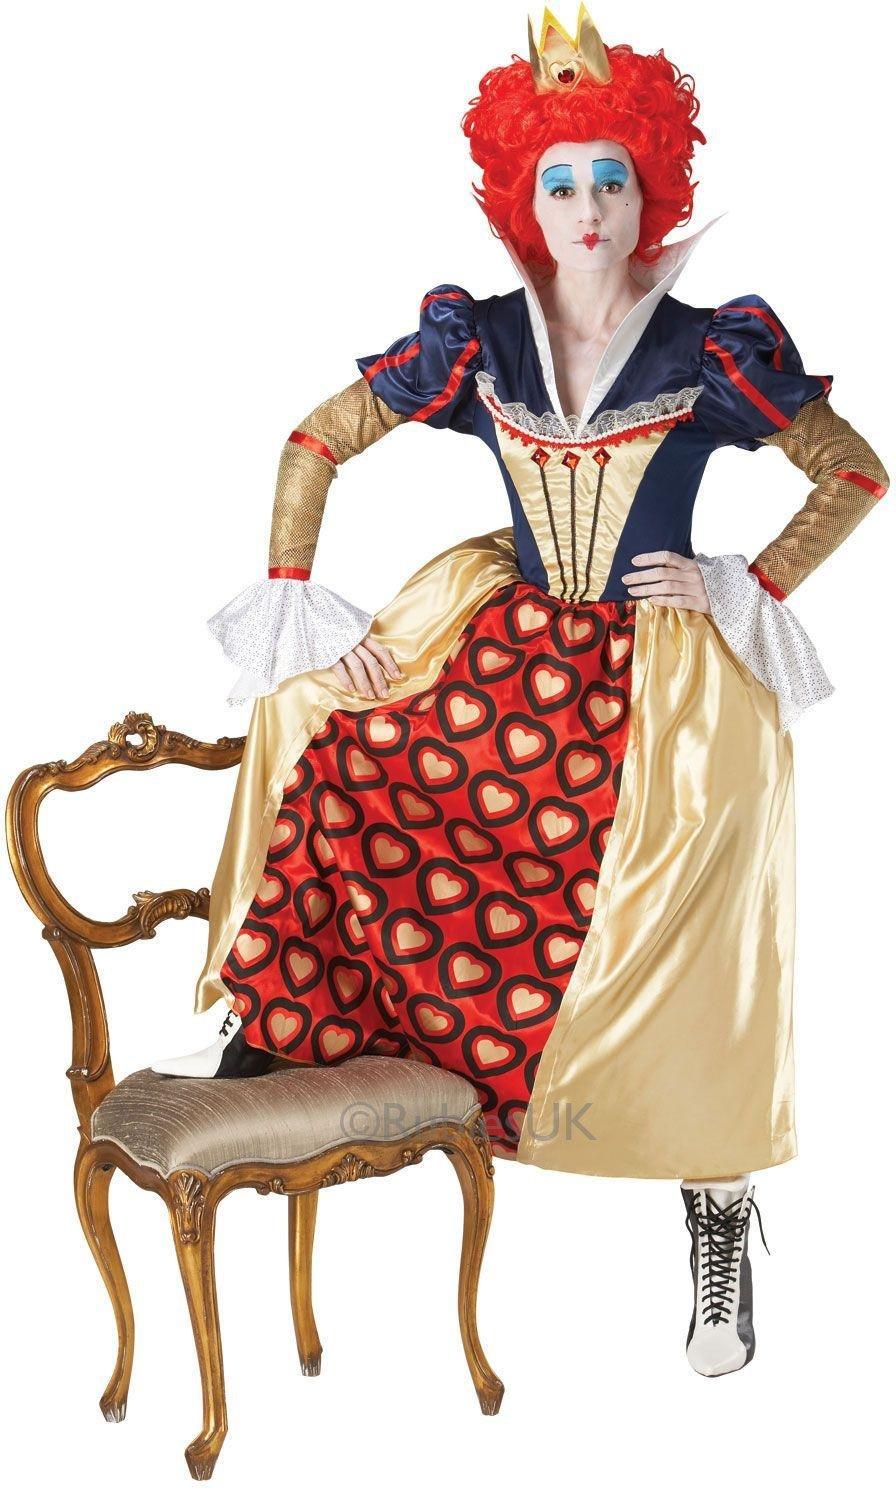 Image of Alice in Wonderland - Red Queen - Costume - Size - 12-14